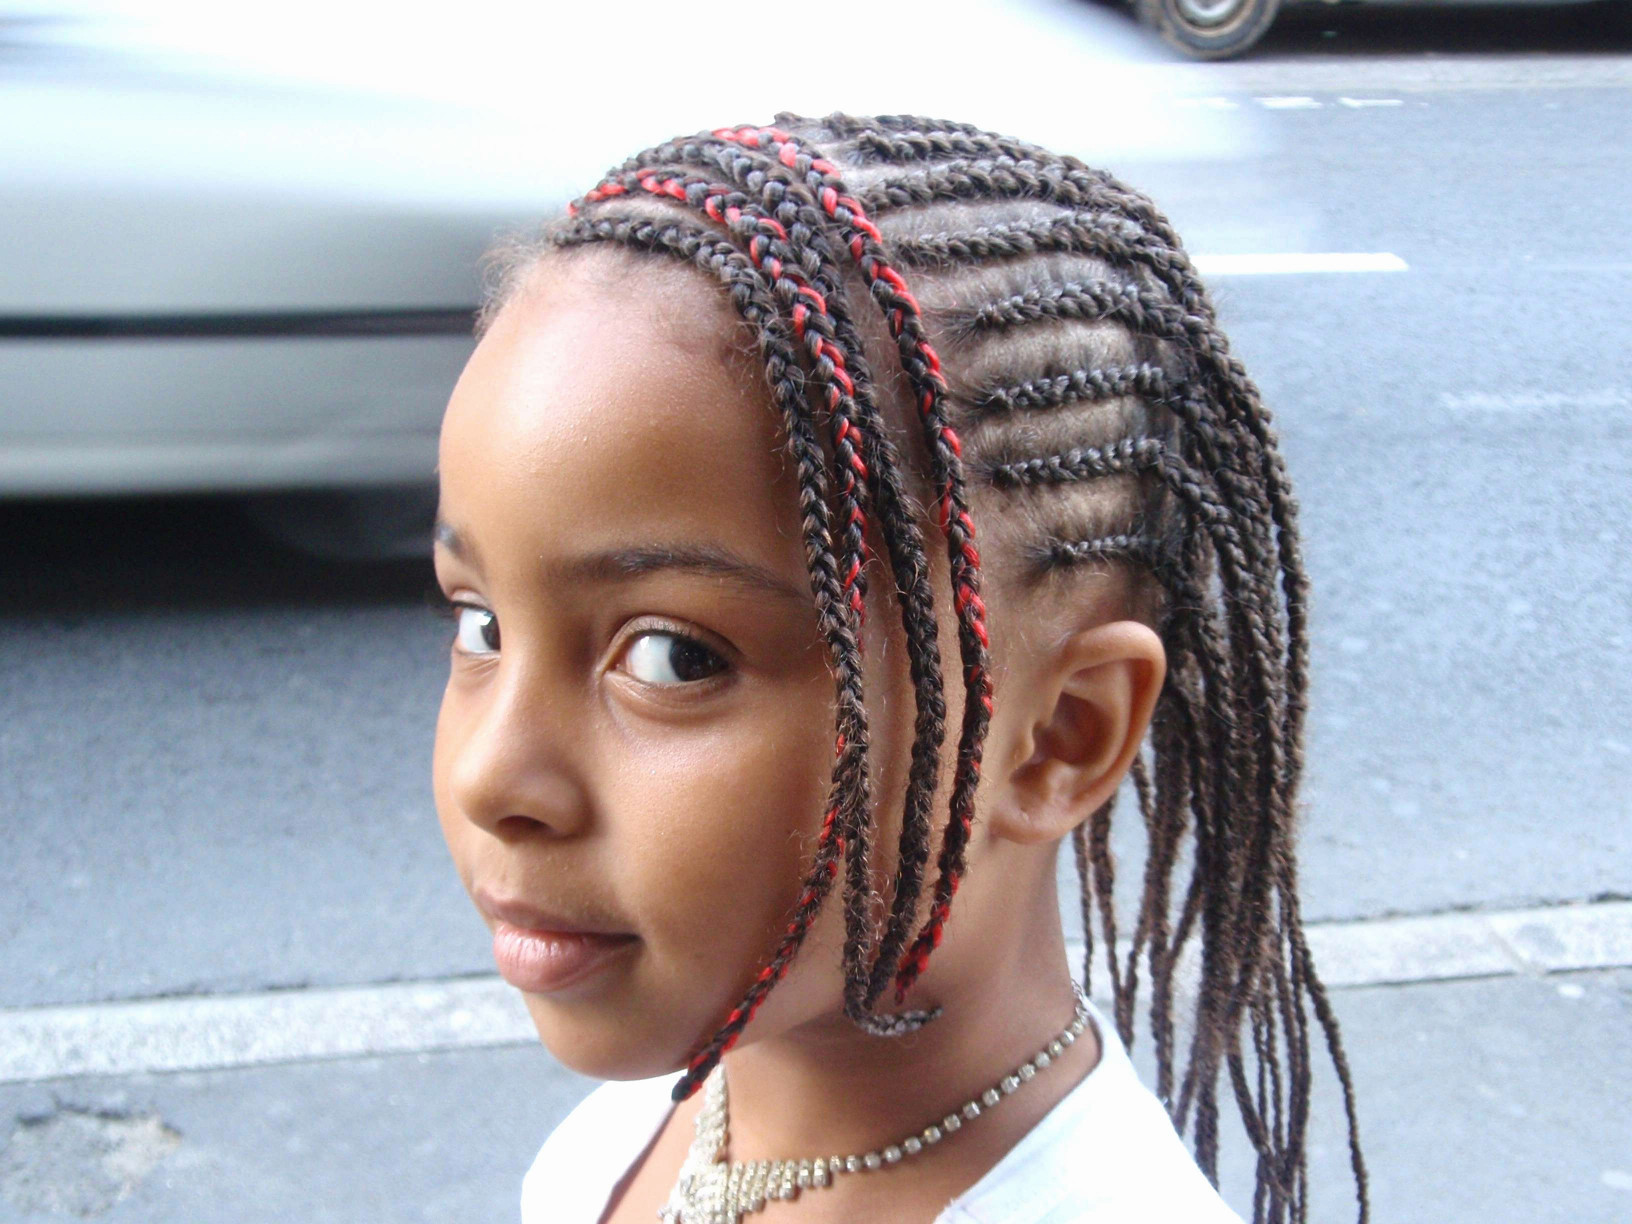 coupe afro enfant coiffure tresse enfant types coiffure petite fille tresse inspirant of coupe afro enfant